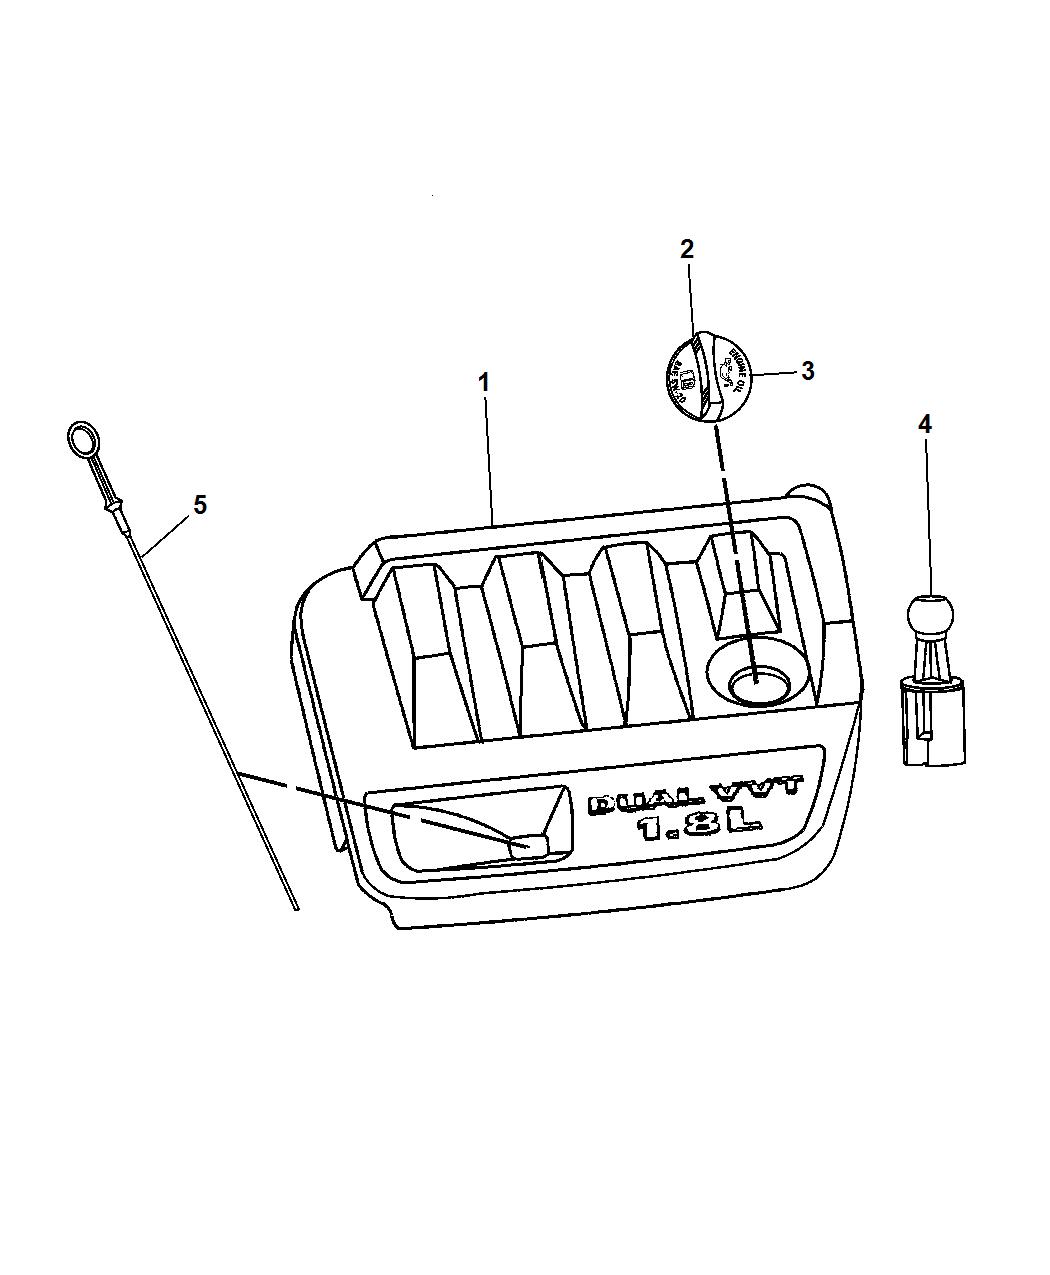 [RE_2333] 2007 Dodge Caliber Engine Mounts Diagram Free